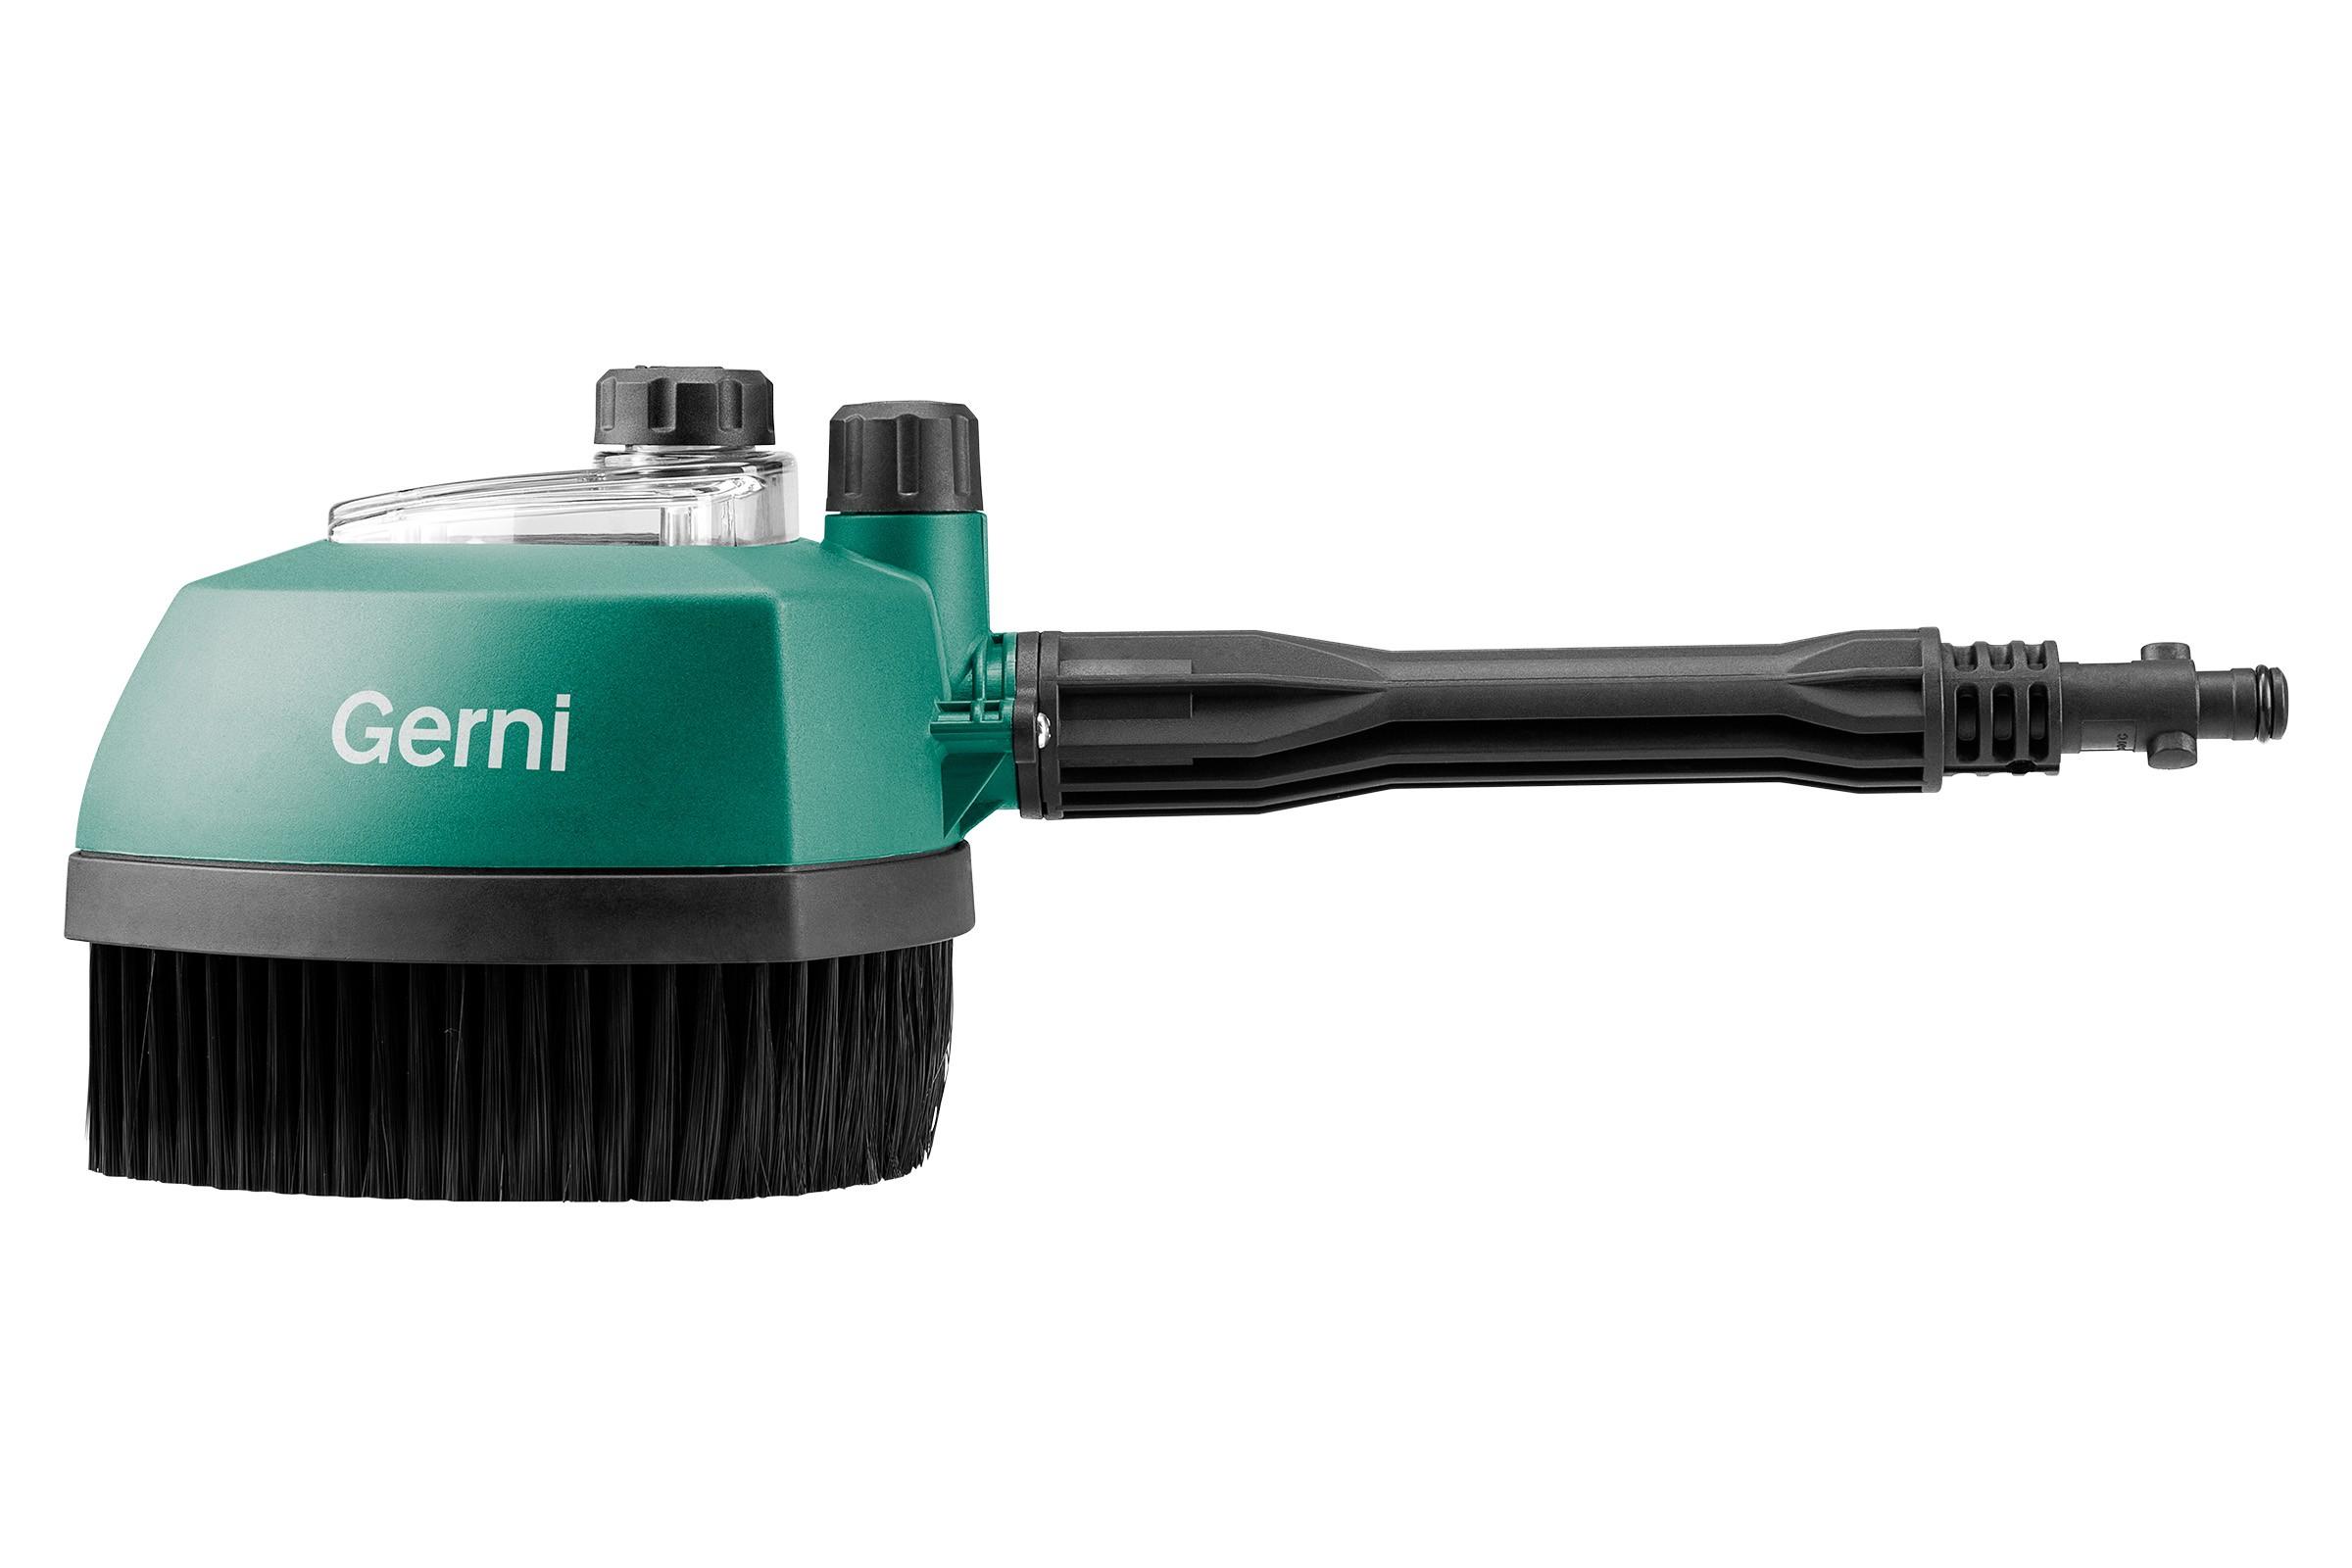 Gerni Rotary Detergent Brush - Side